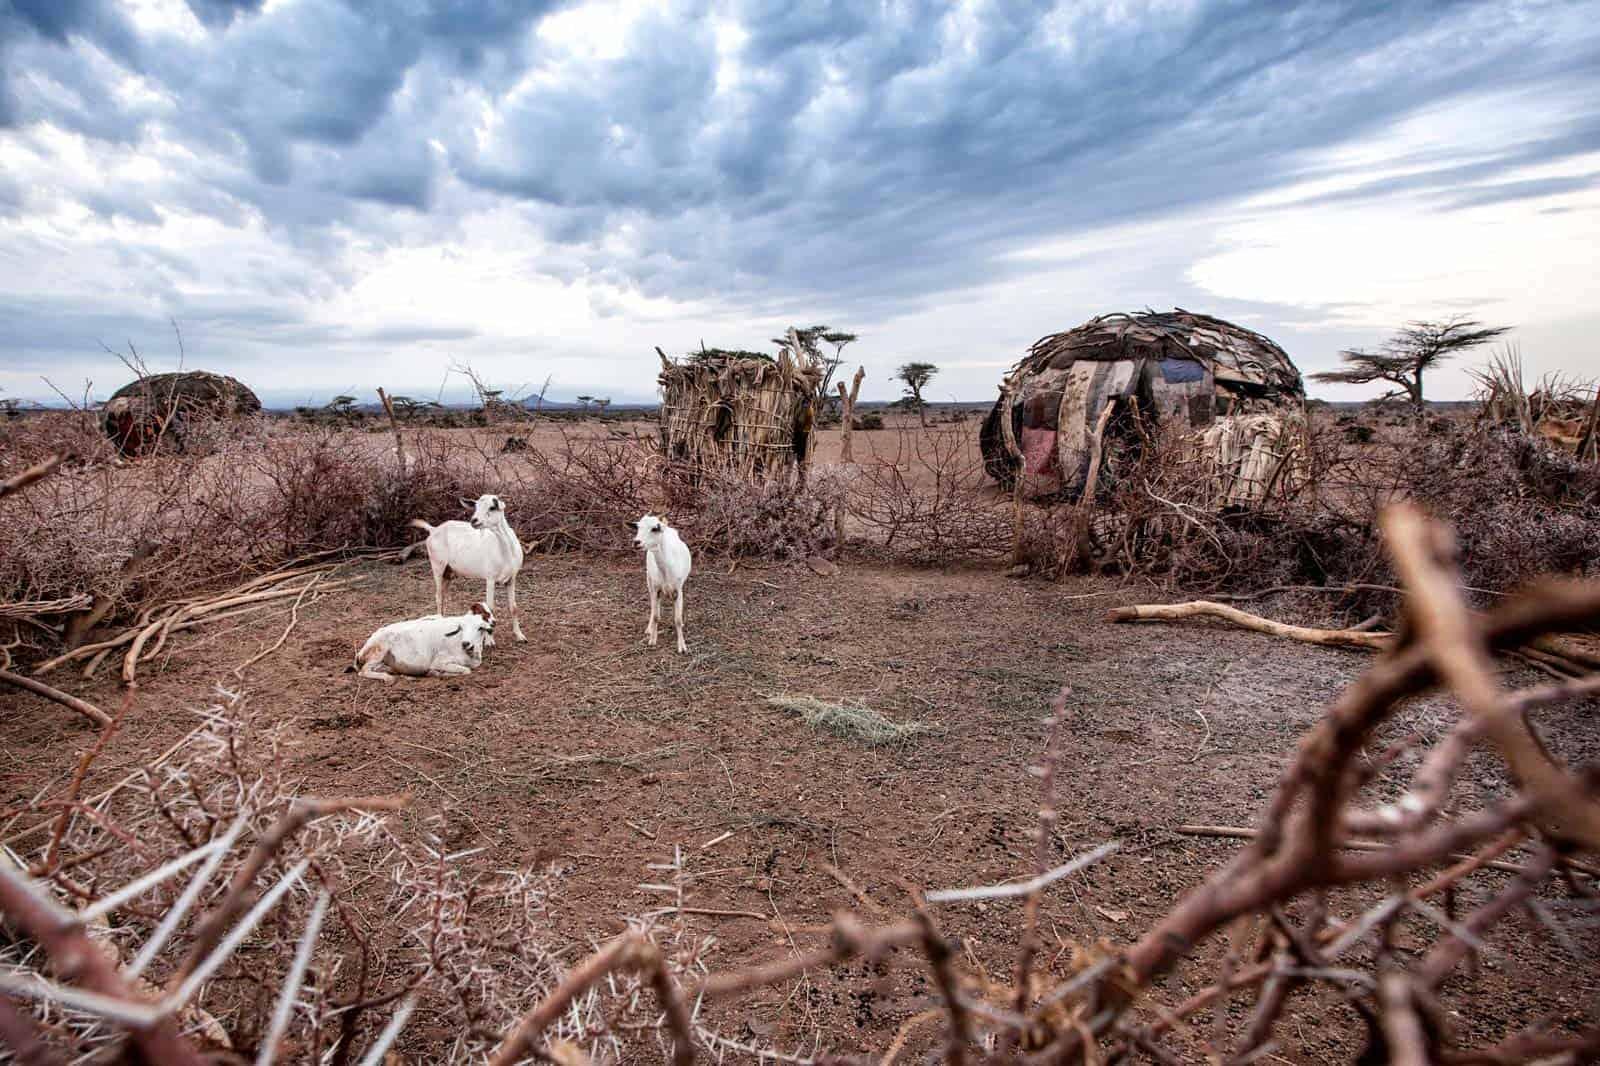 Aldeia da tribo Samburu, Quénia